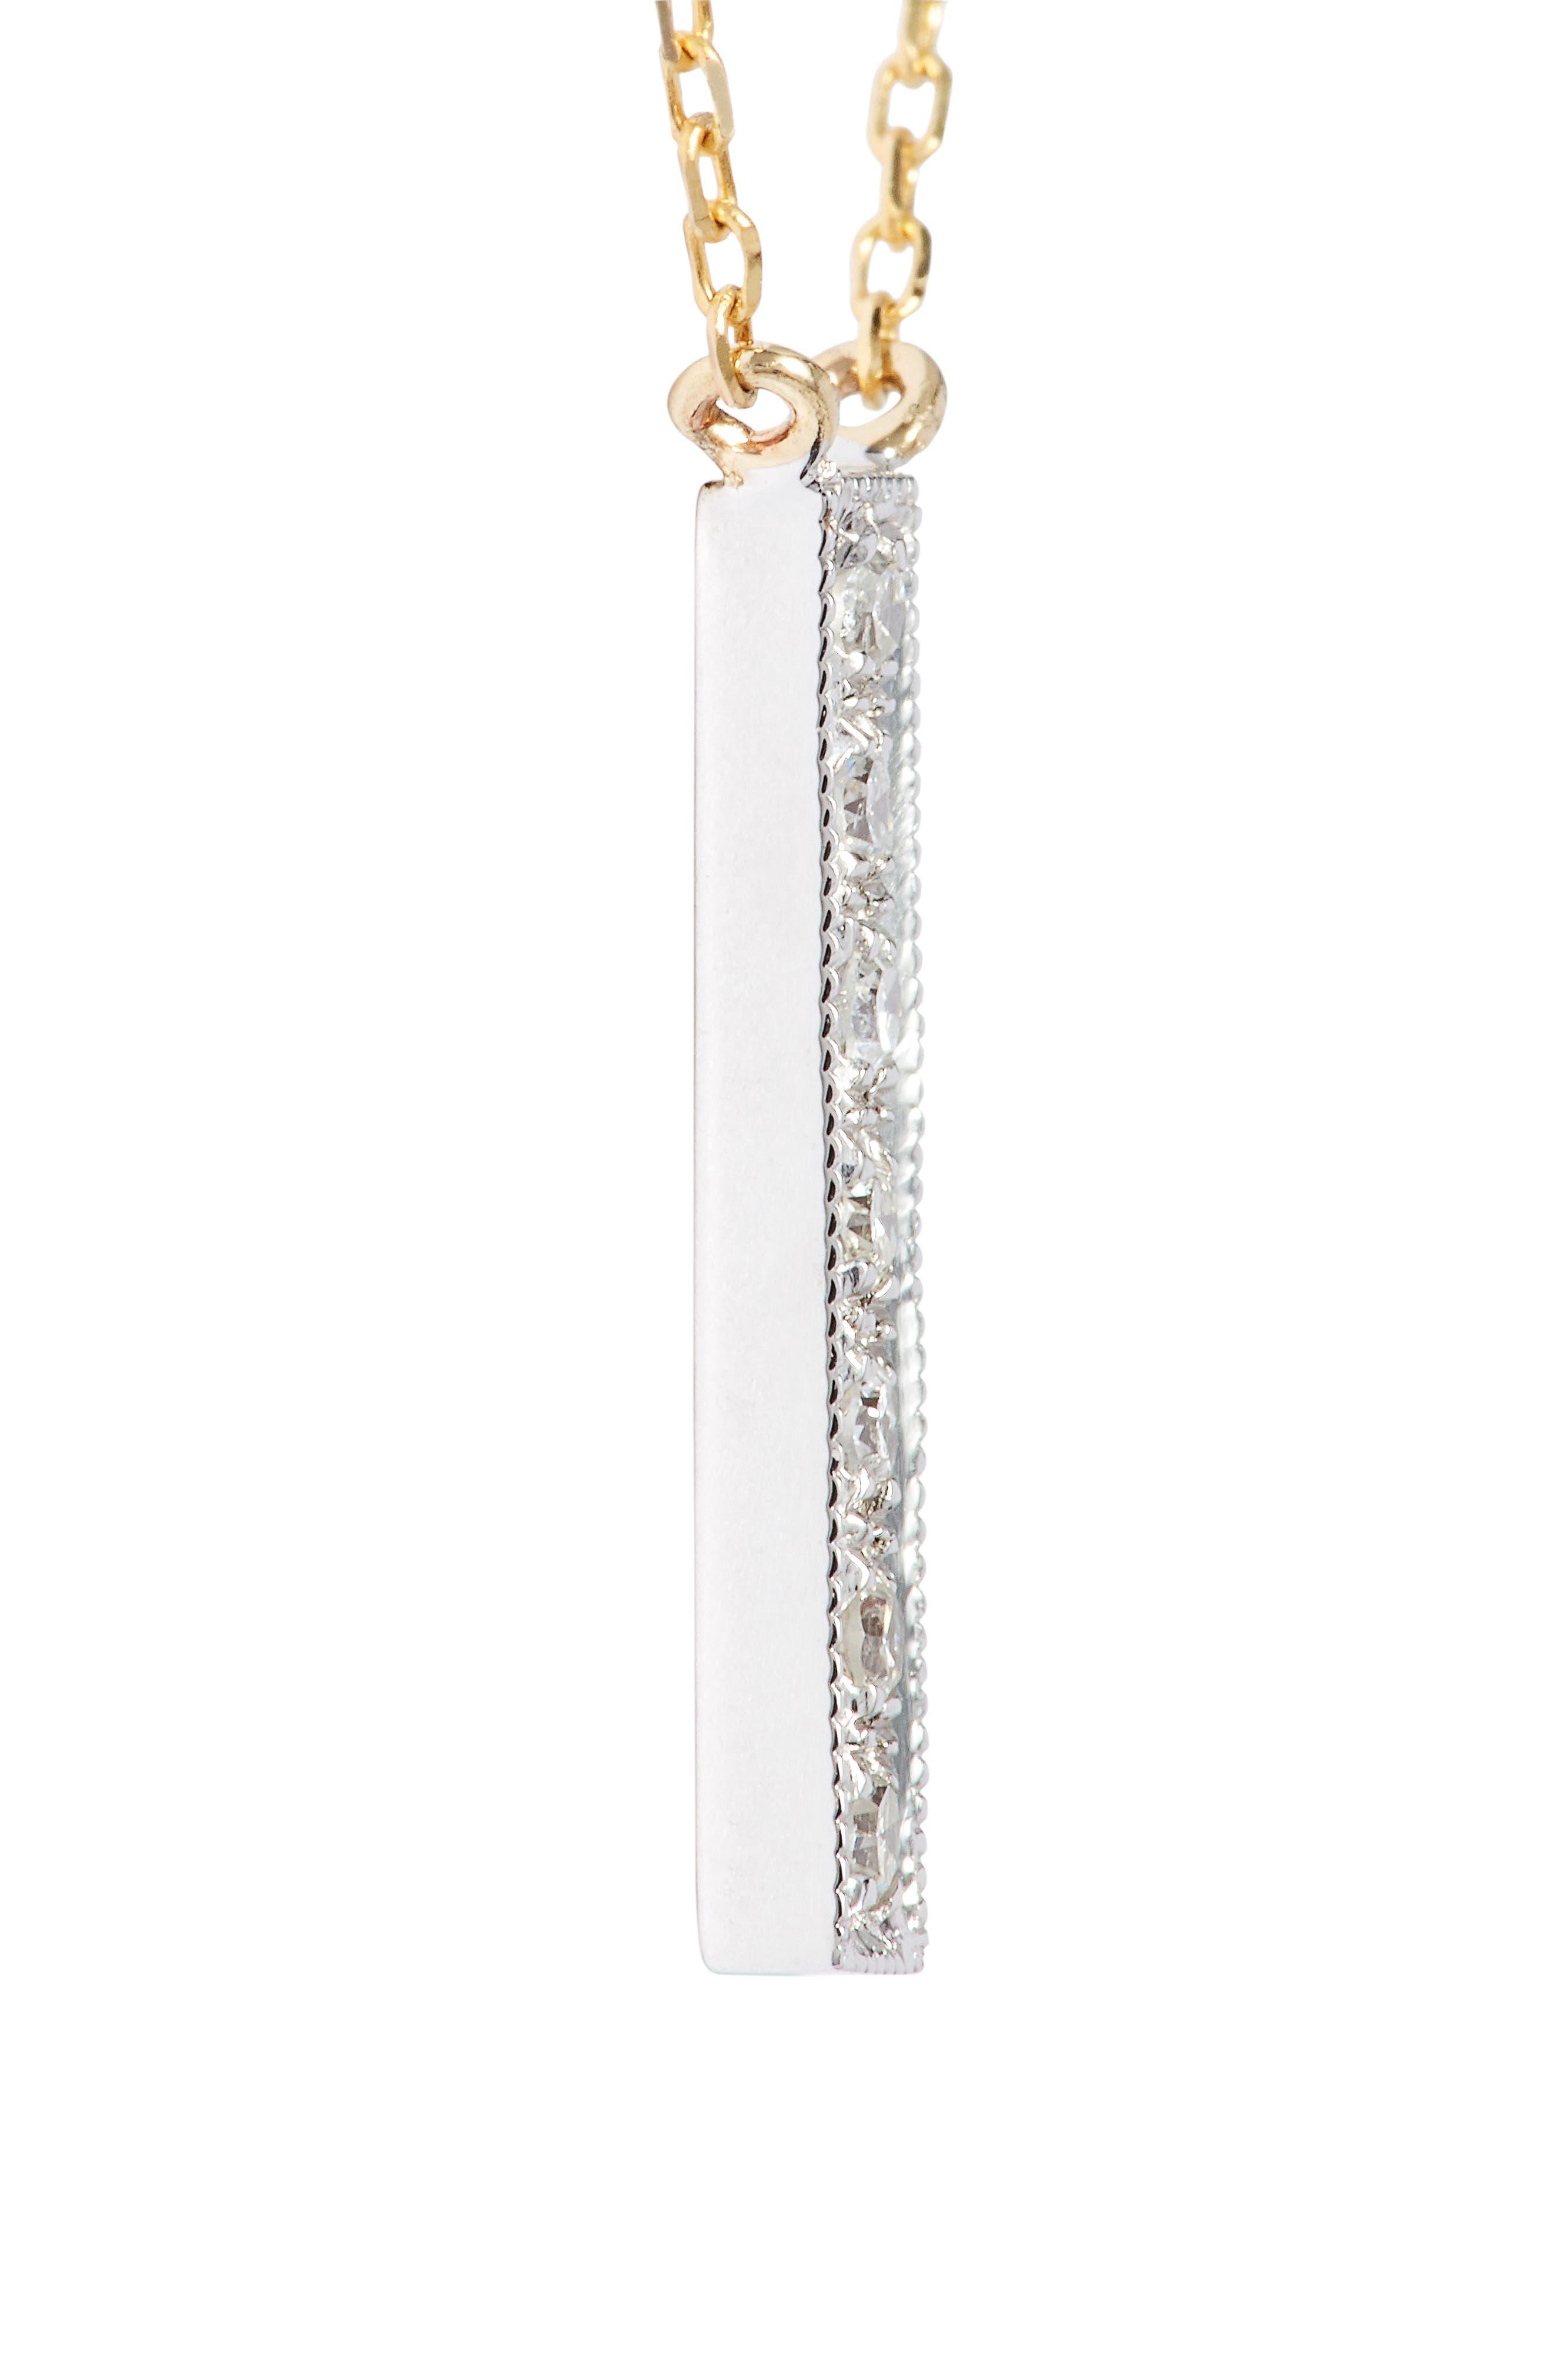 Sylvie Rose Vertical Bar Diamond Pendant Necklace,                             Alternate thumbnail 5, color,                             YELLOW GOLD